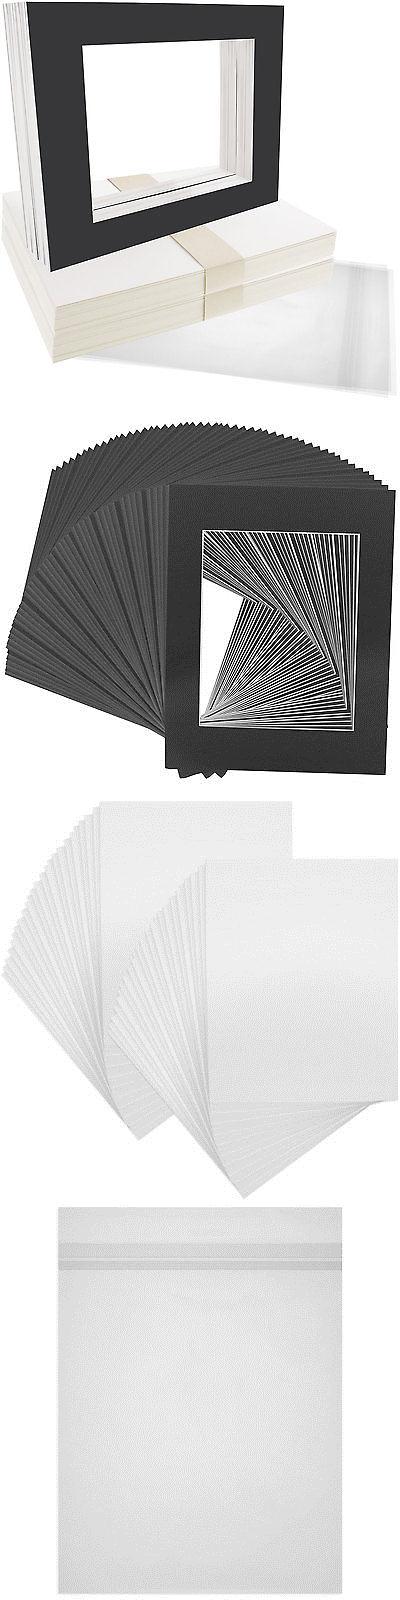 Framing Mats 37576: 50 11 X14 Matte Black Picture Mat Set White Core ...